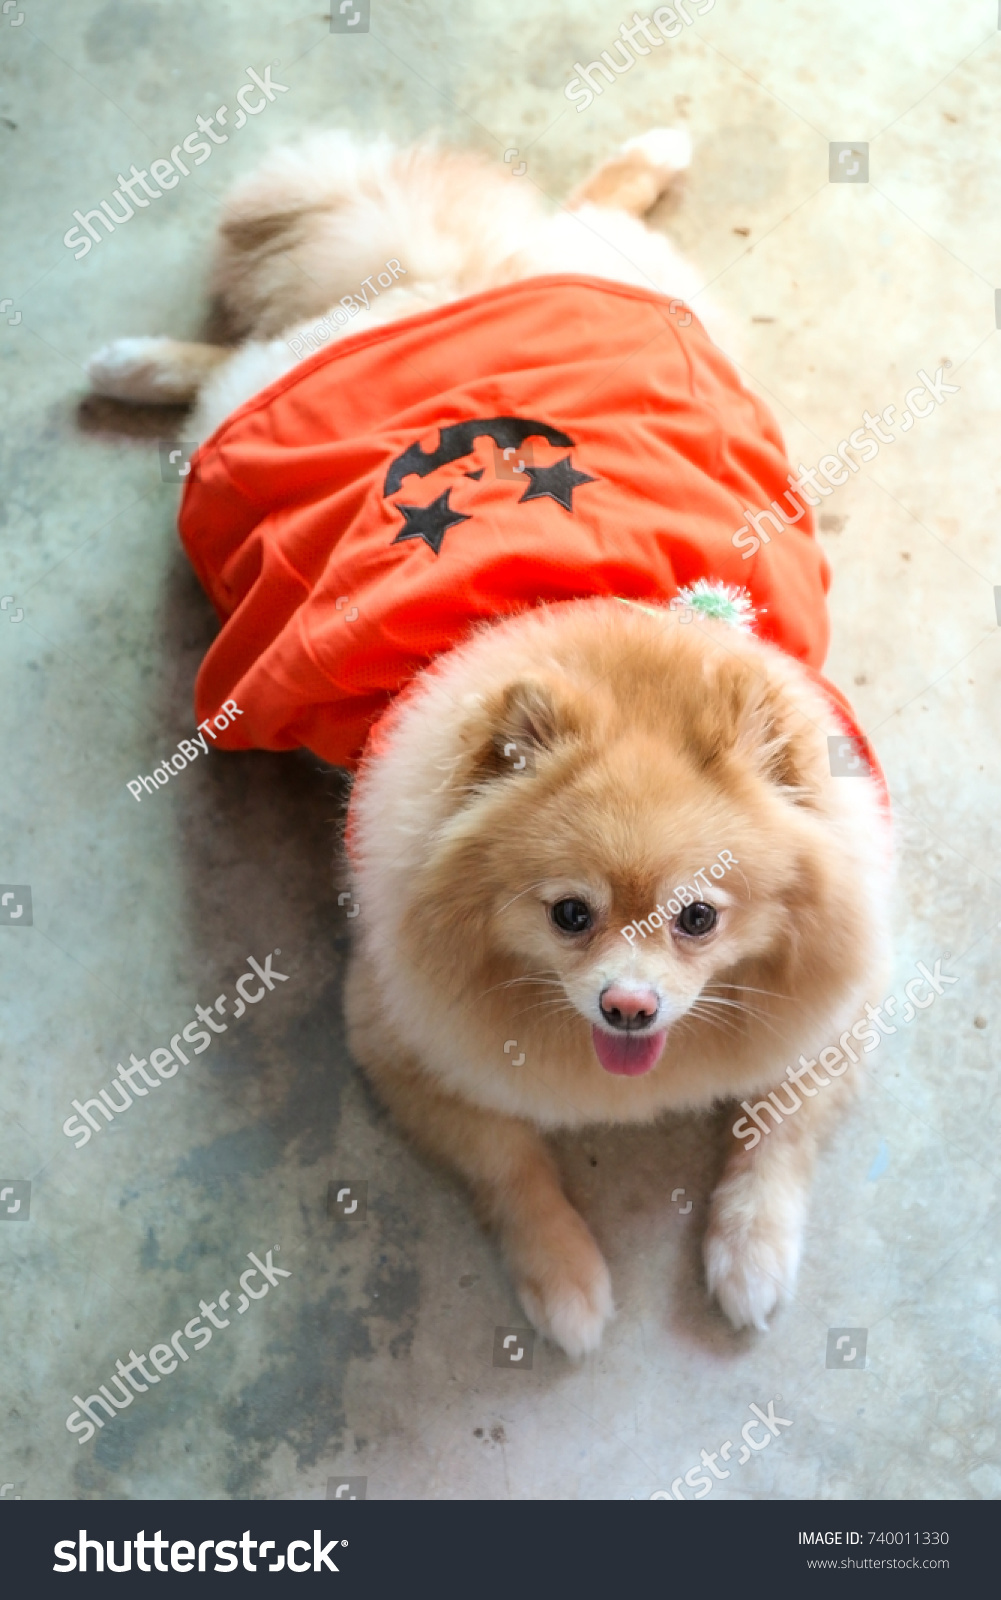 pomeranian dog wear orange halloween dress stock photo (edit now